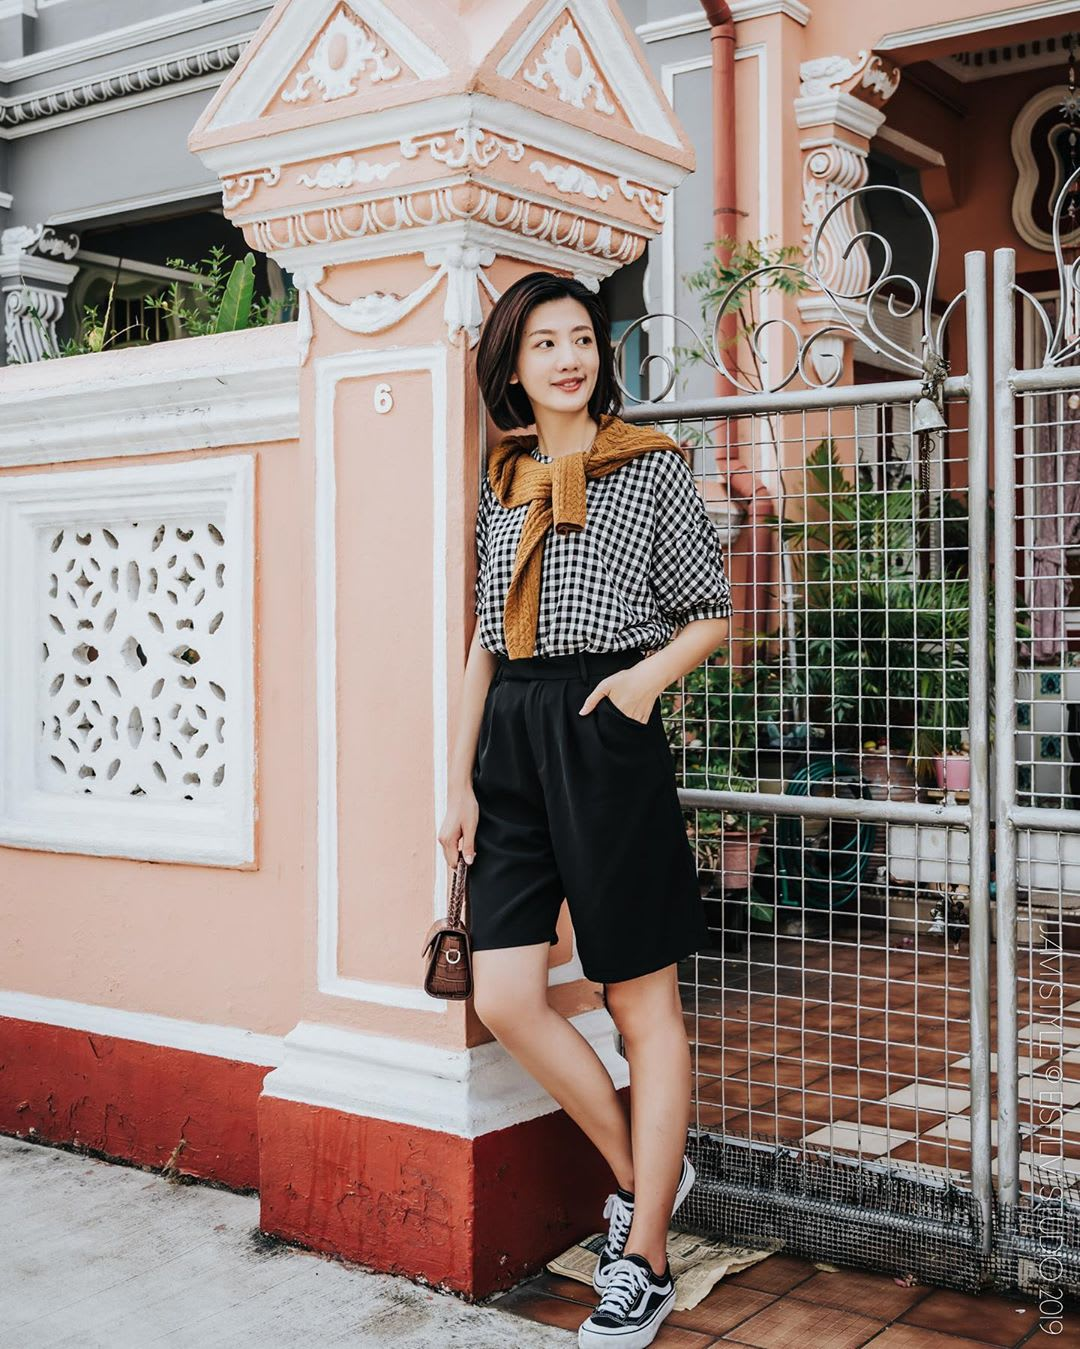 Joo Chiat Singapore 2